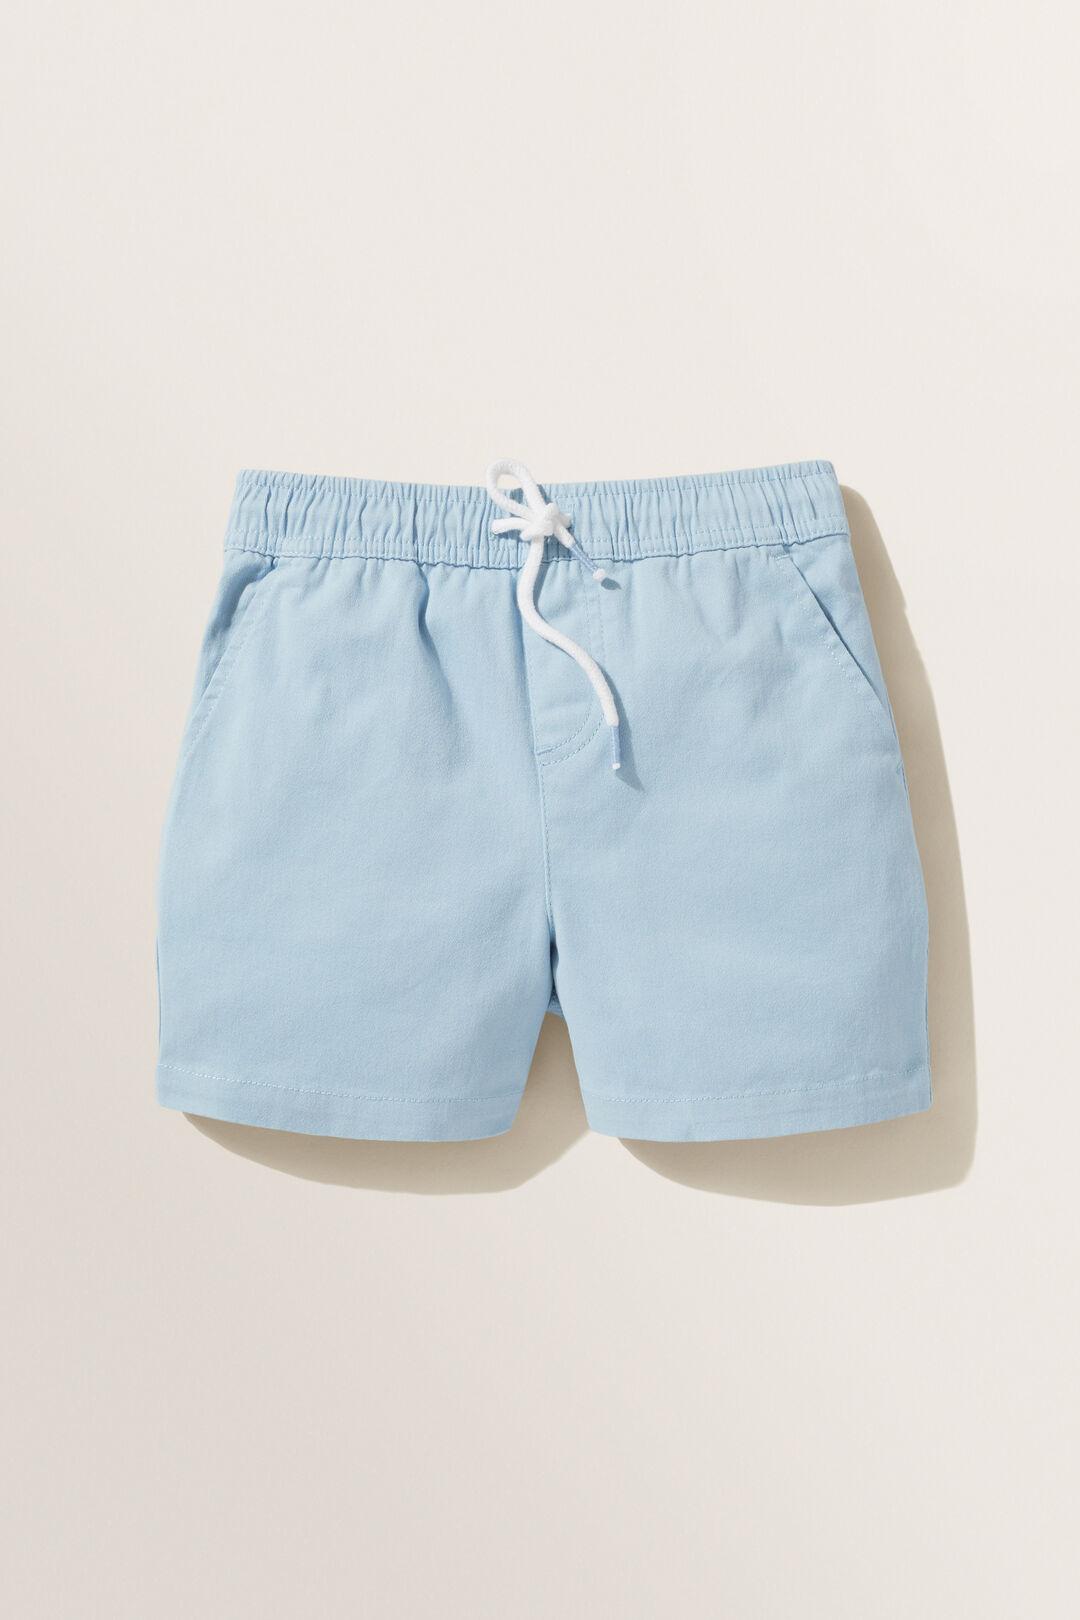 Logo Shorts  Pale Blue  hi-res